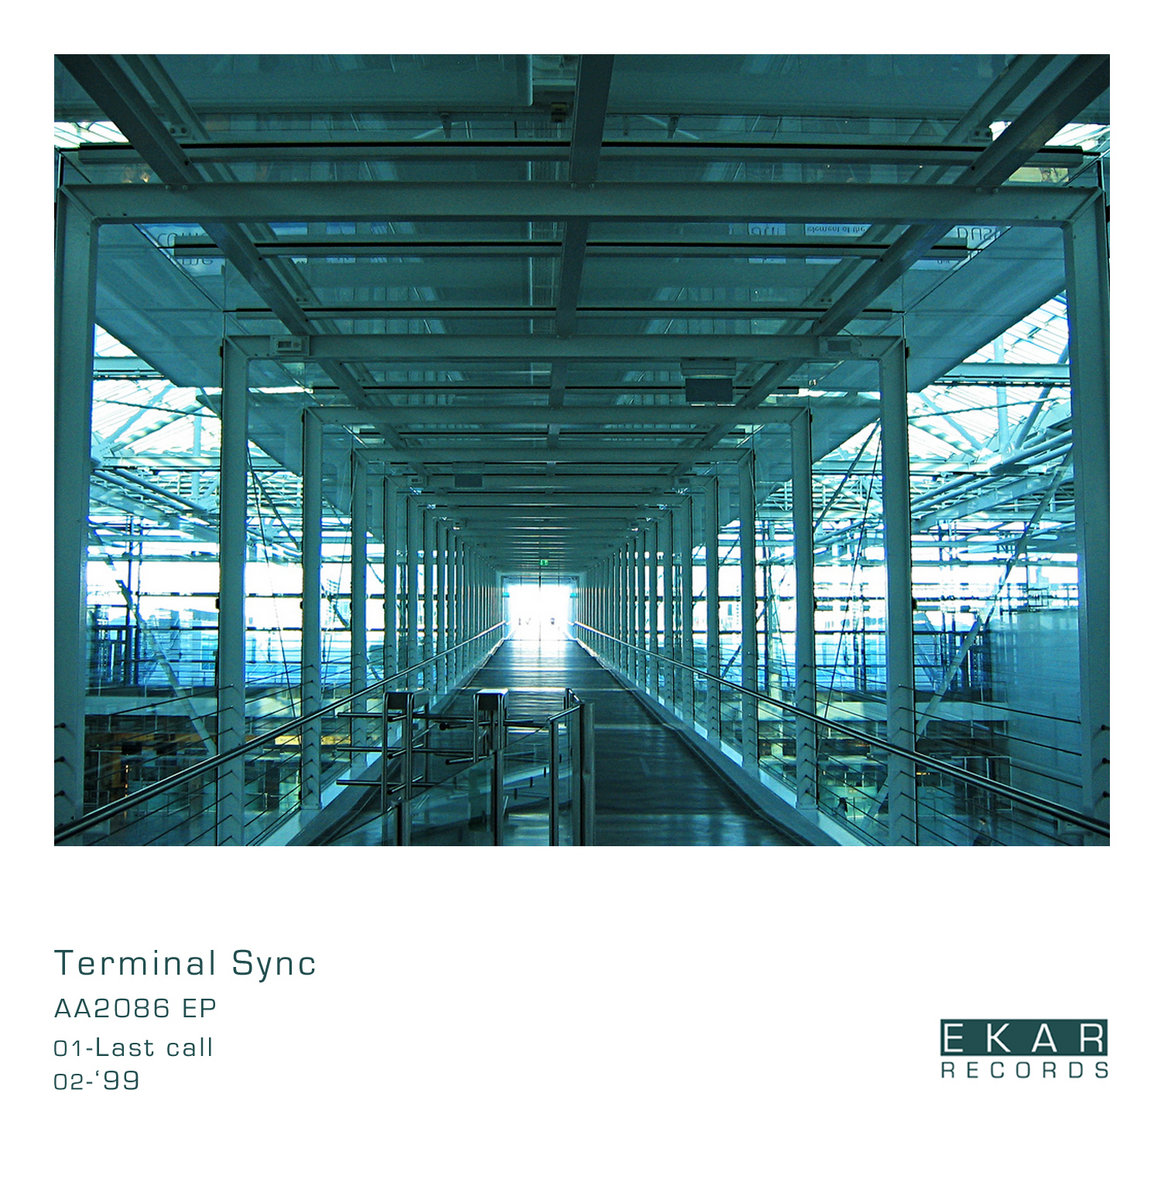 Terminal Sync – AA2086